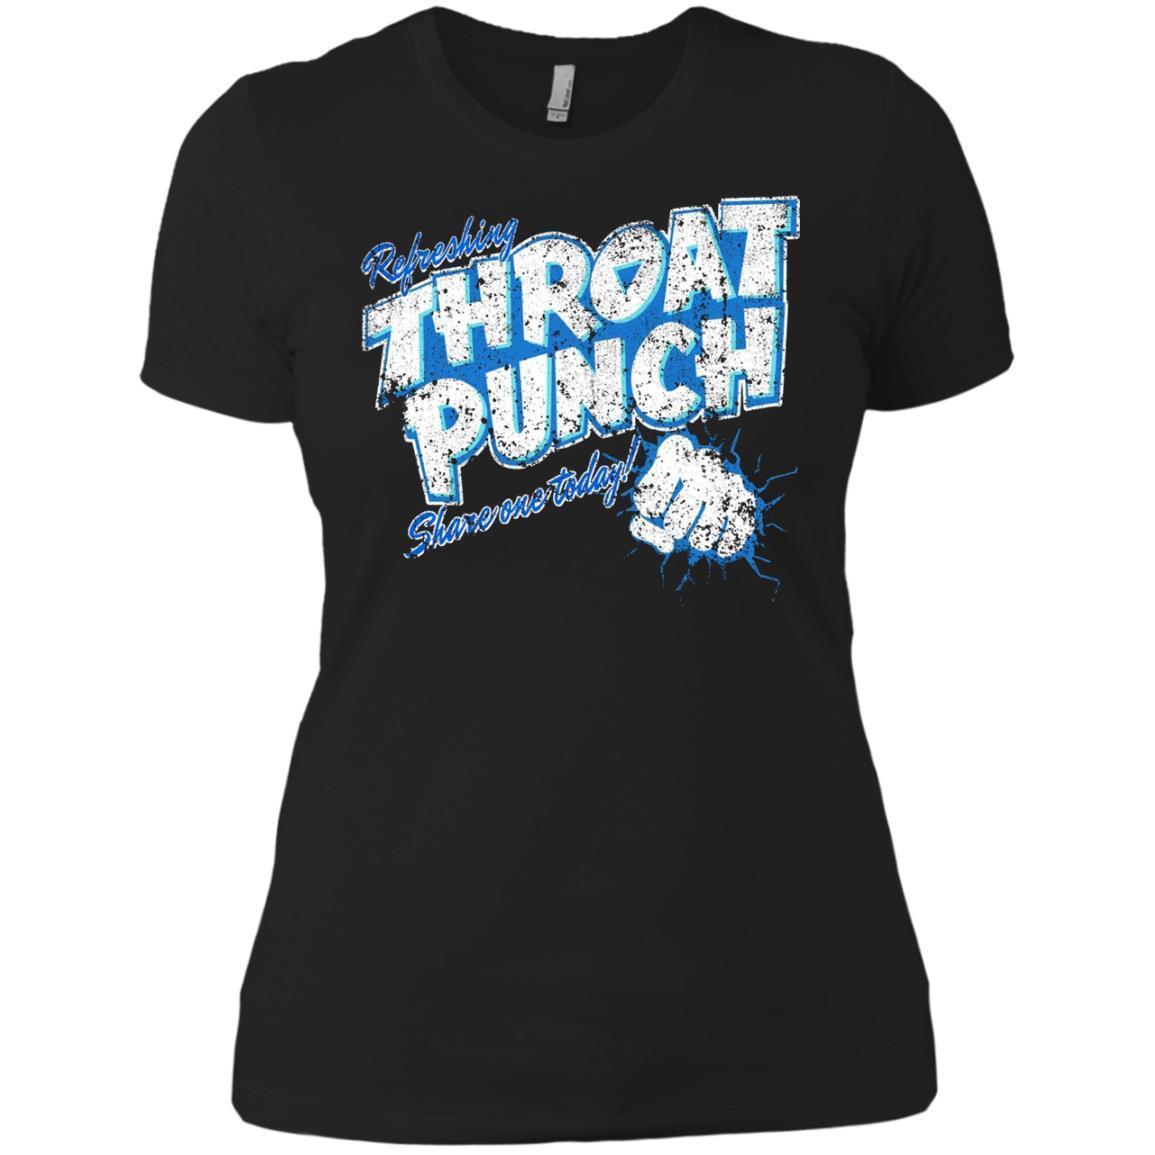 Refreshing Throat Punch Grunge – Ladies' Boyfriend T-Shirt